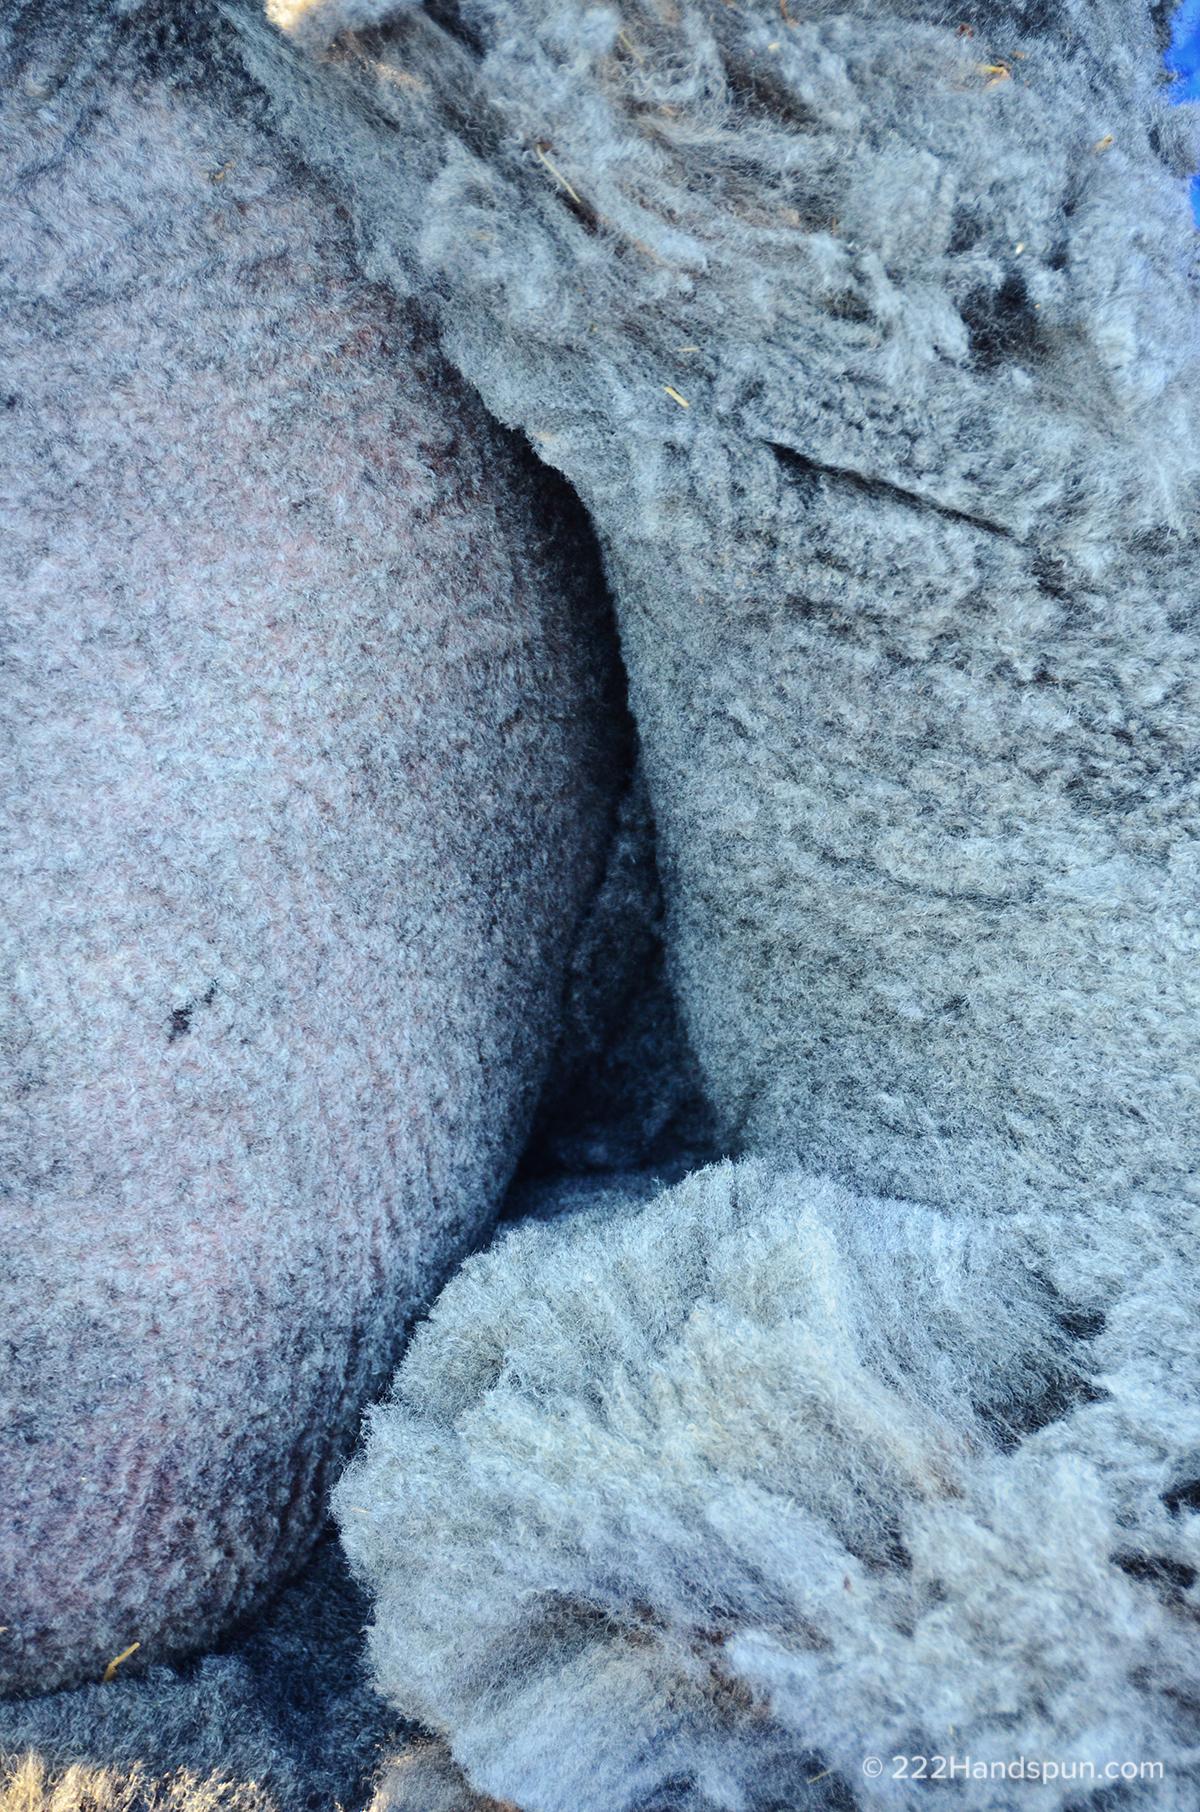 Fleece Coming Off Closeup